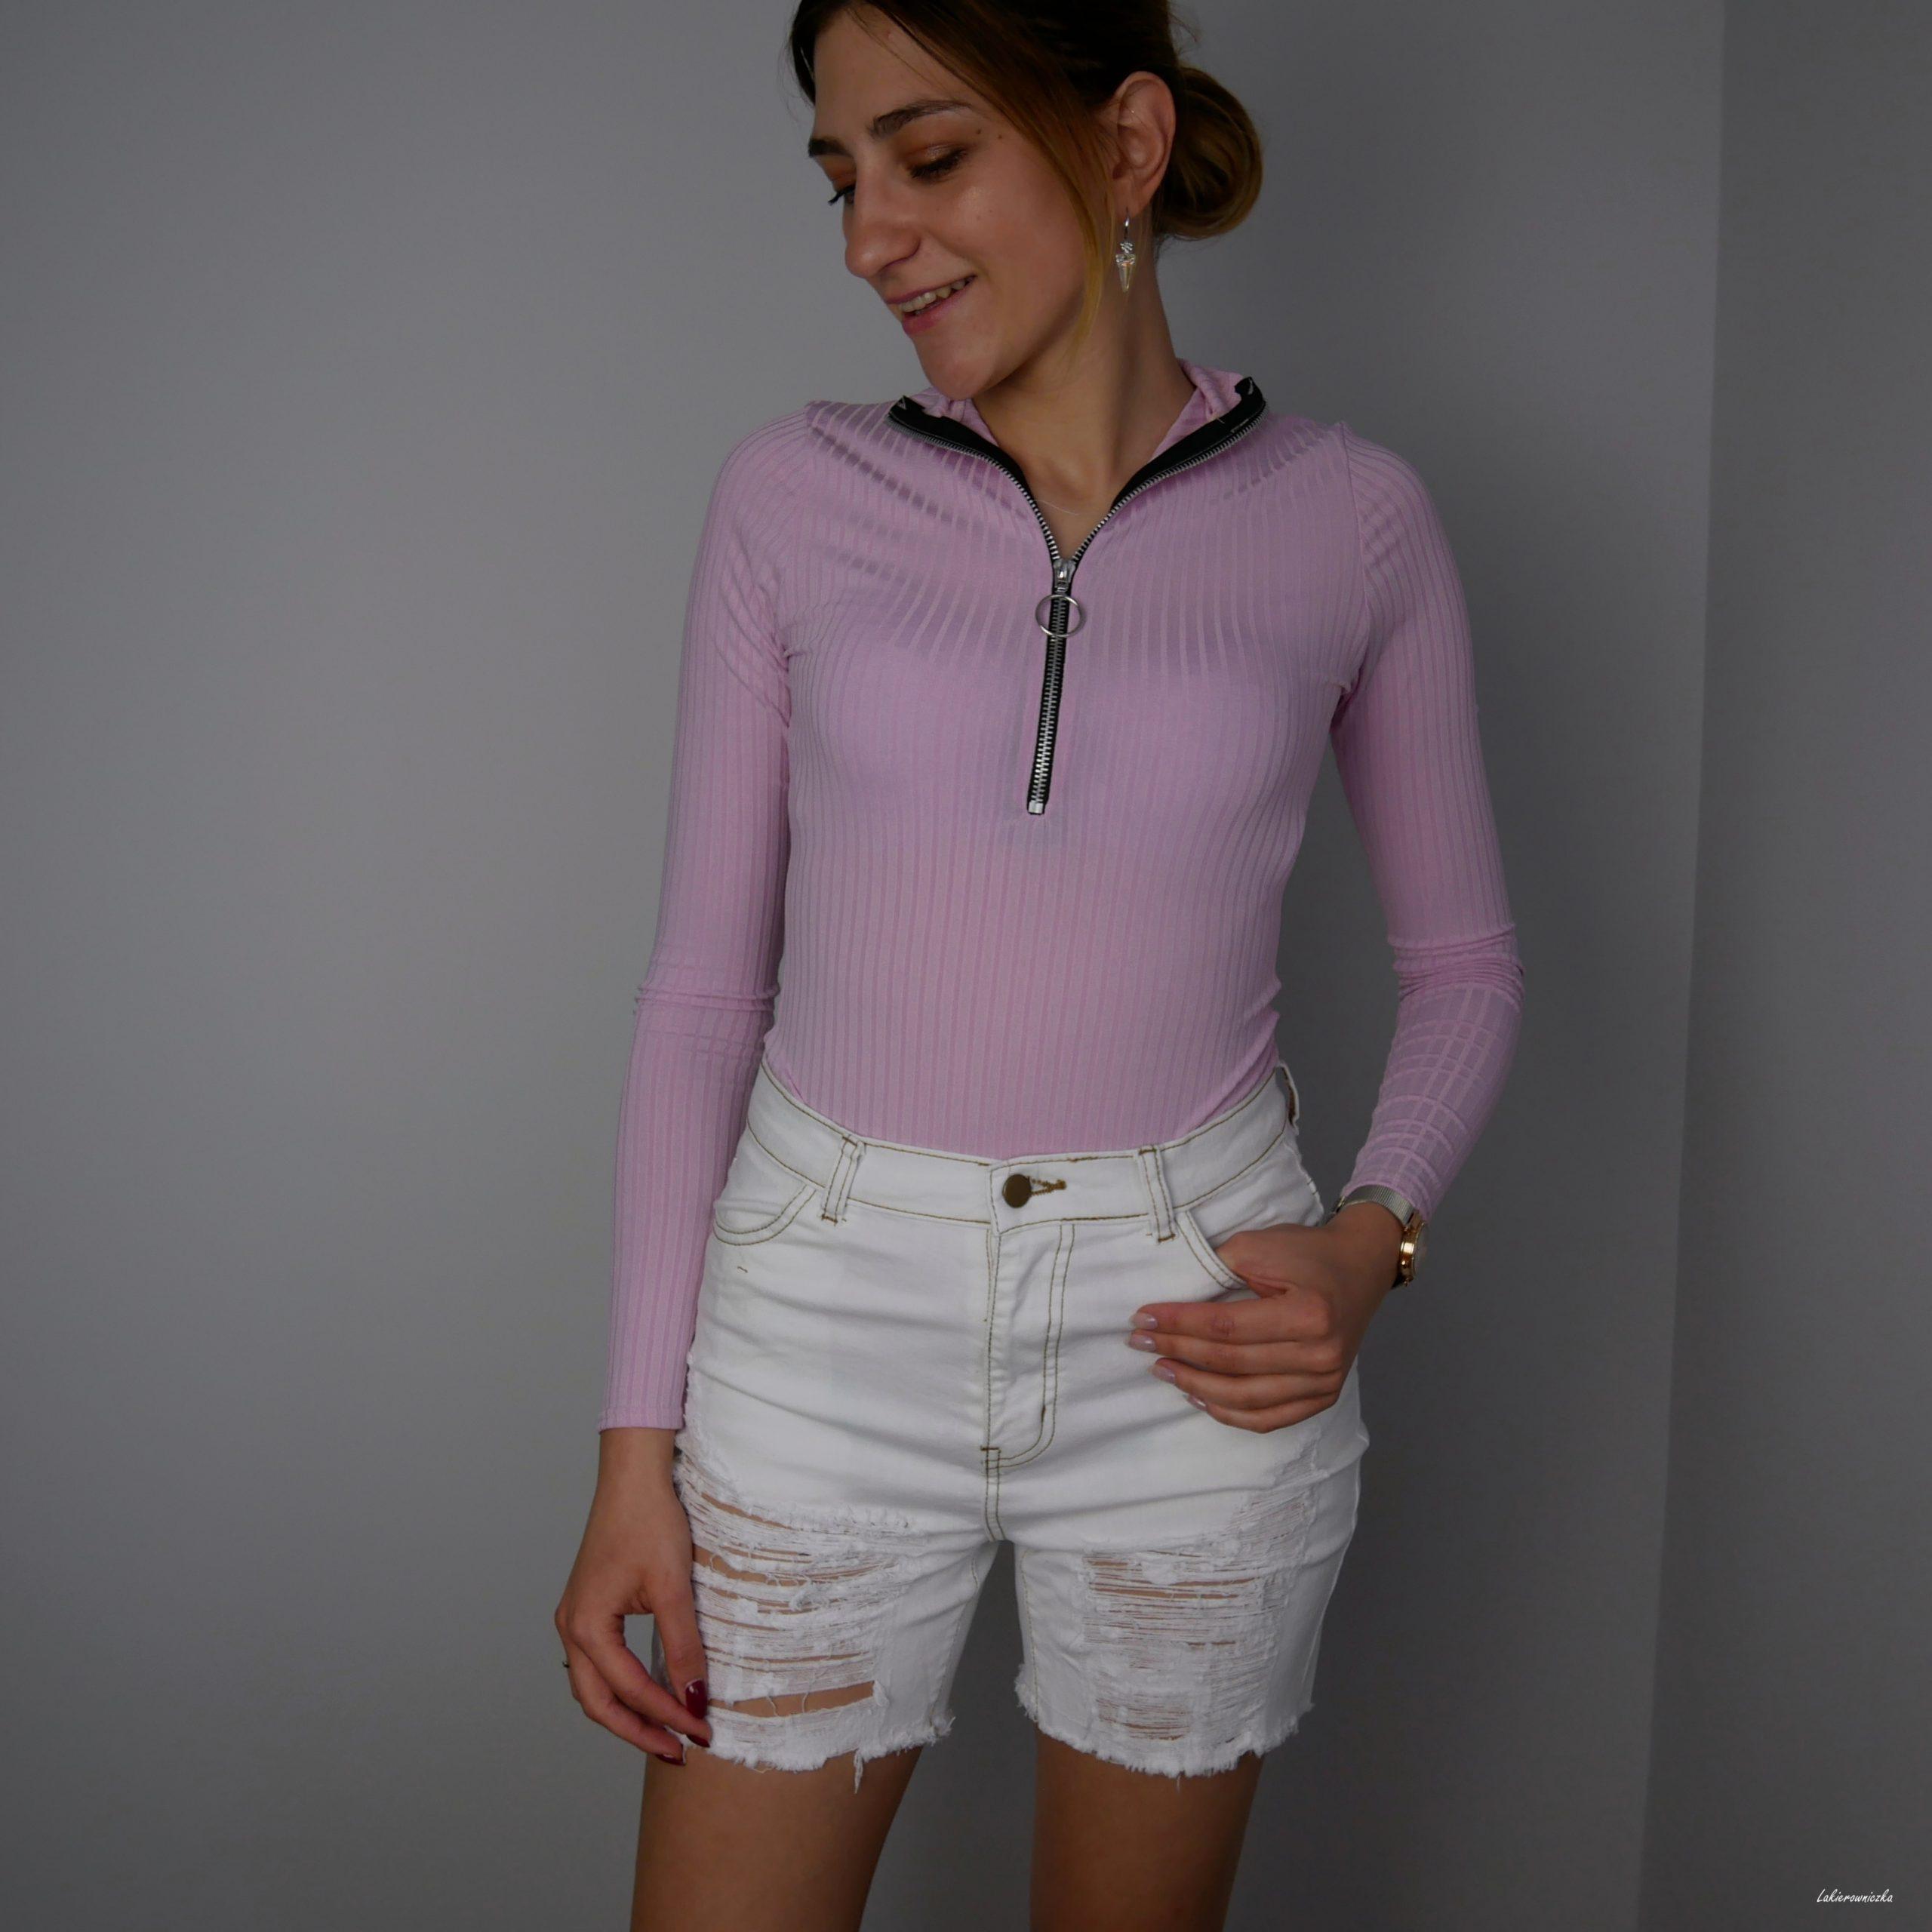 FemmeLuxe-spodnie-w-krate-Lakierowniczka